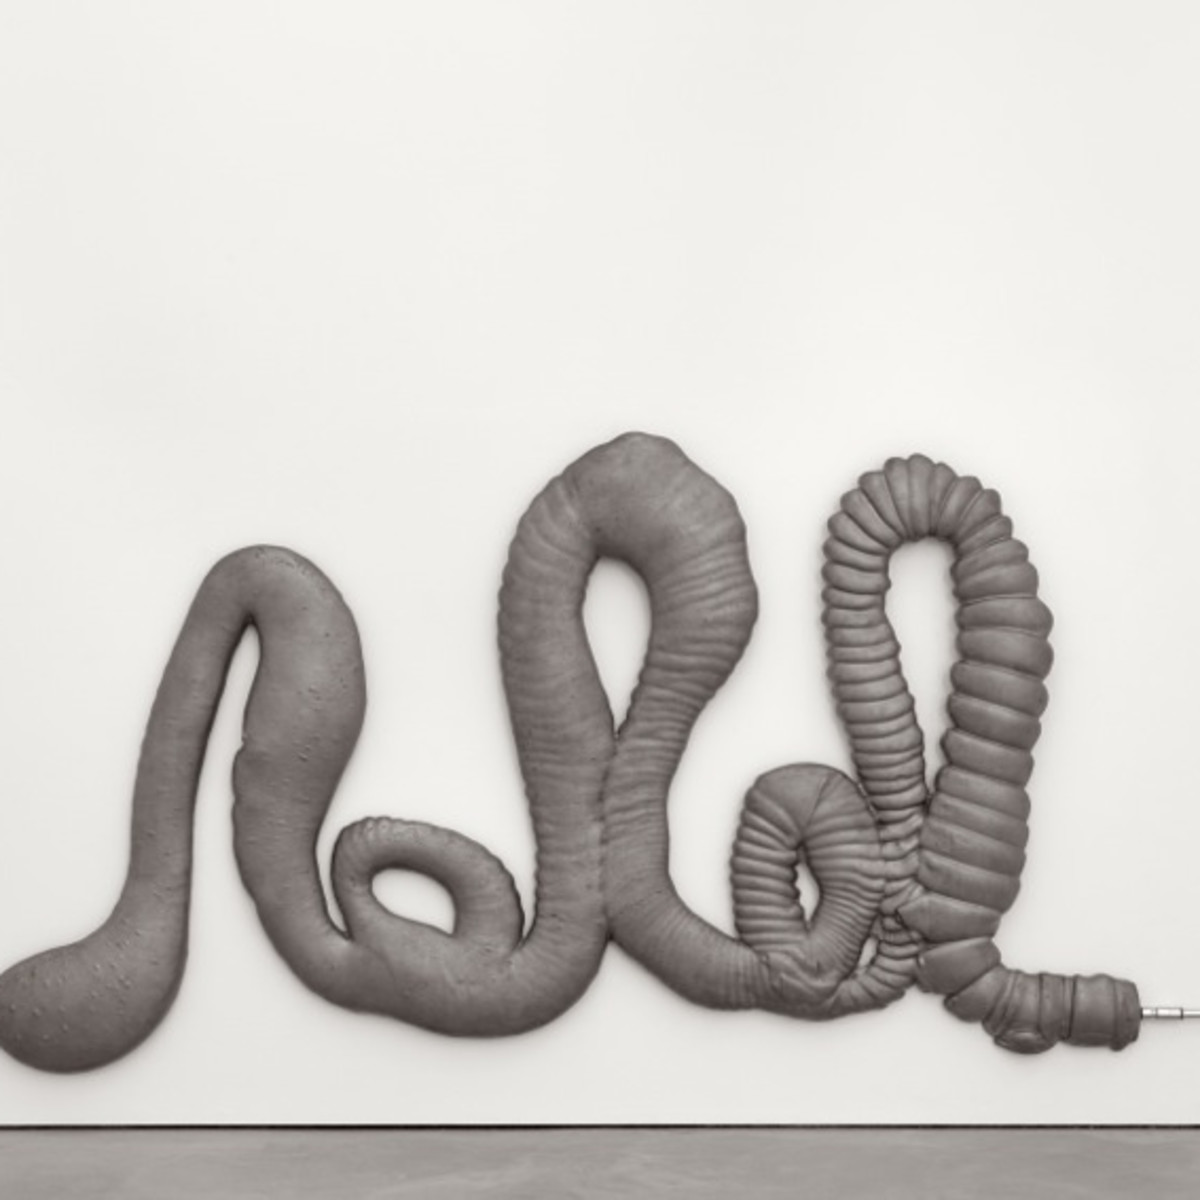 Nicolas Deshayes Heats Up Stuart Shave/Modern Art